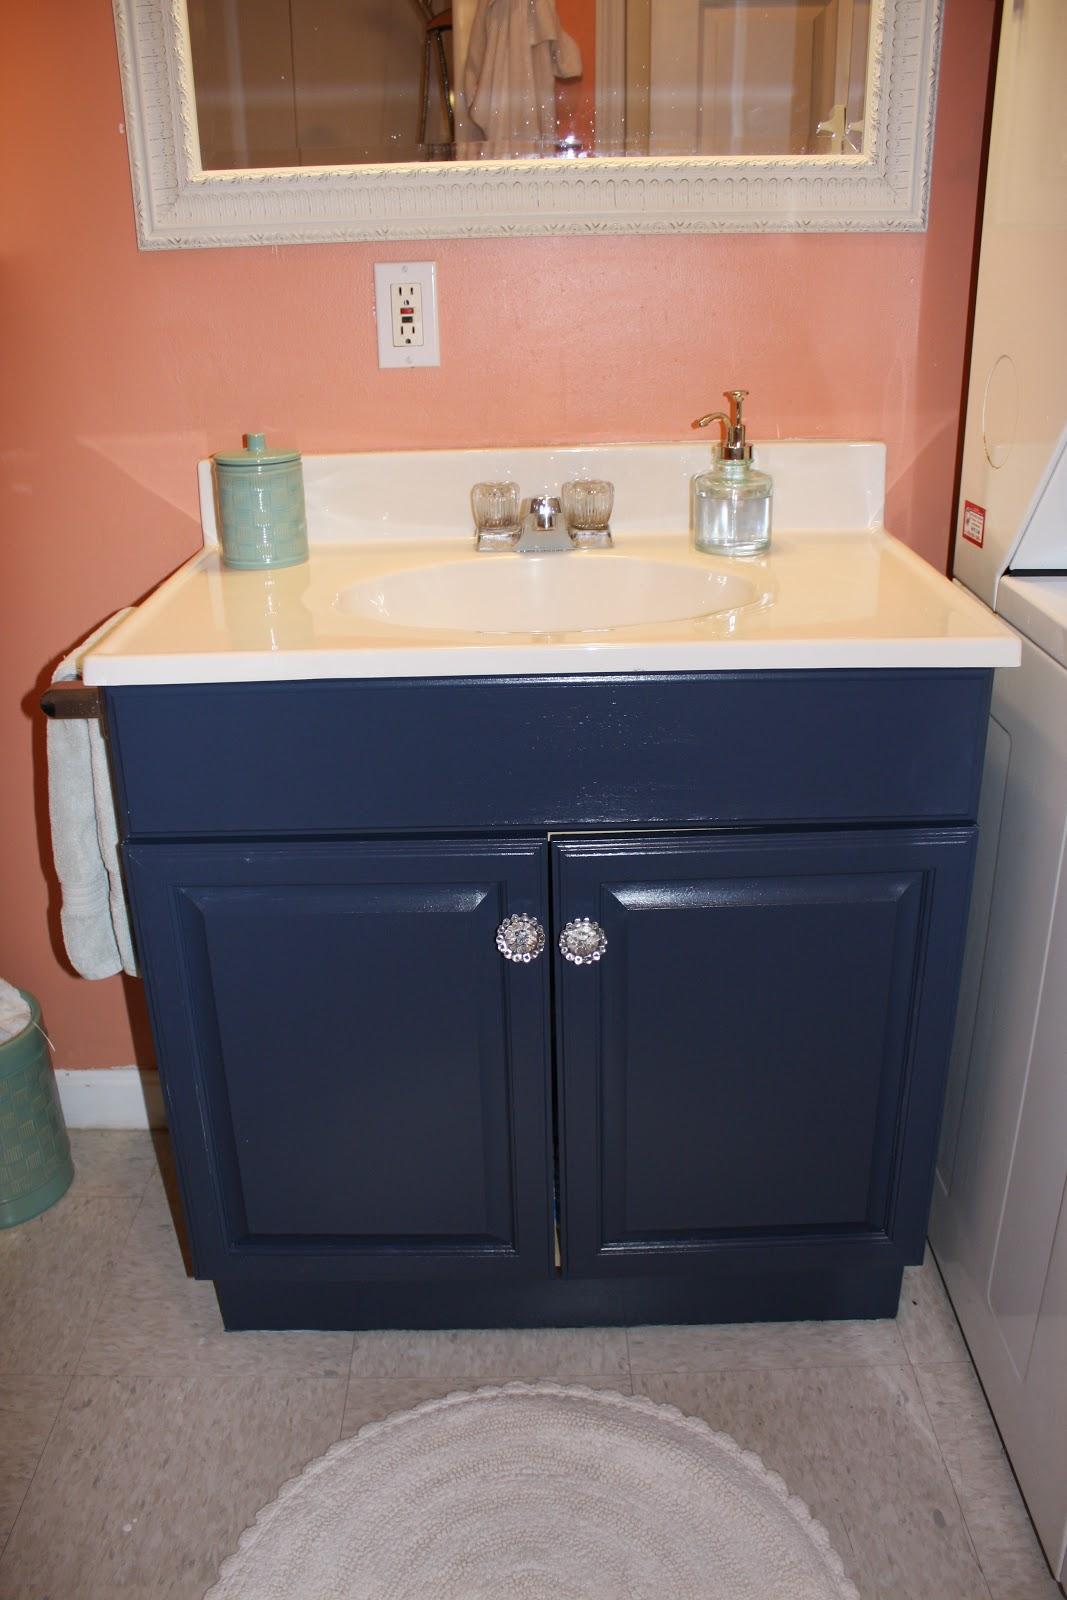 The Elegant House Painting a Laminate Bathroom Vanity